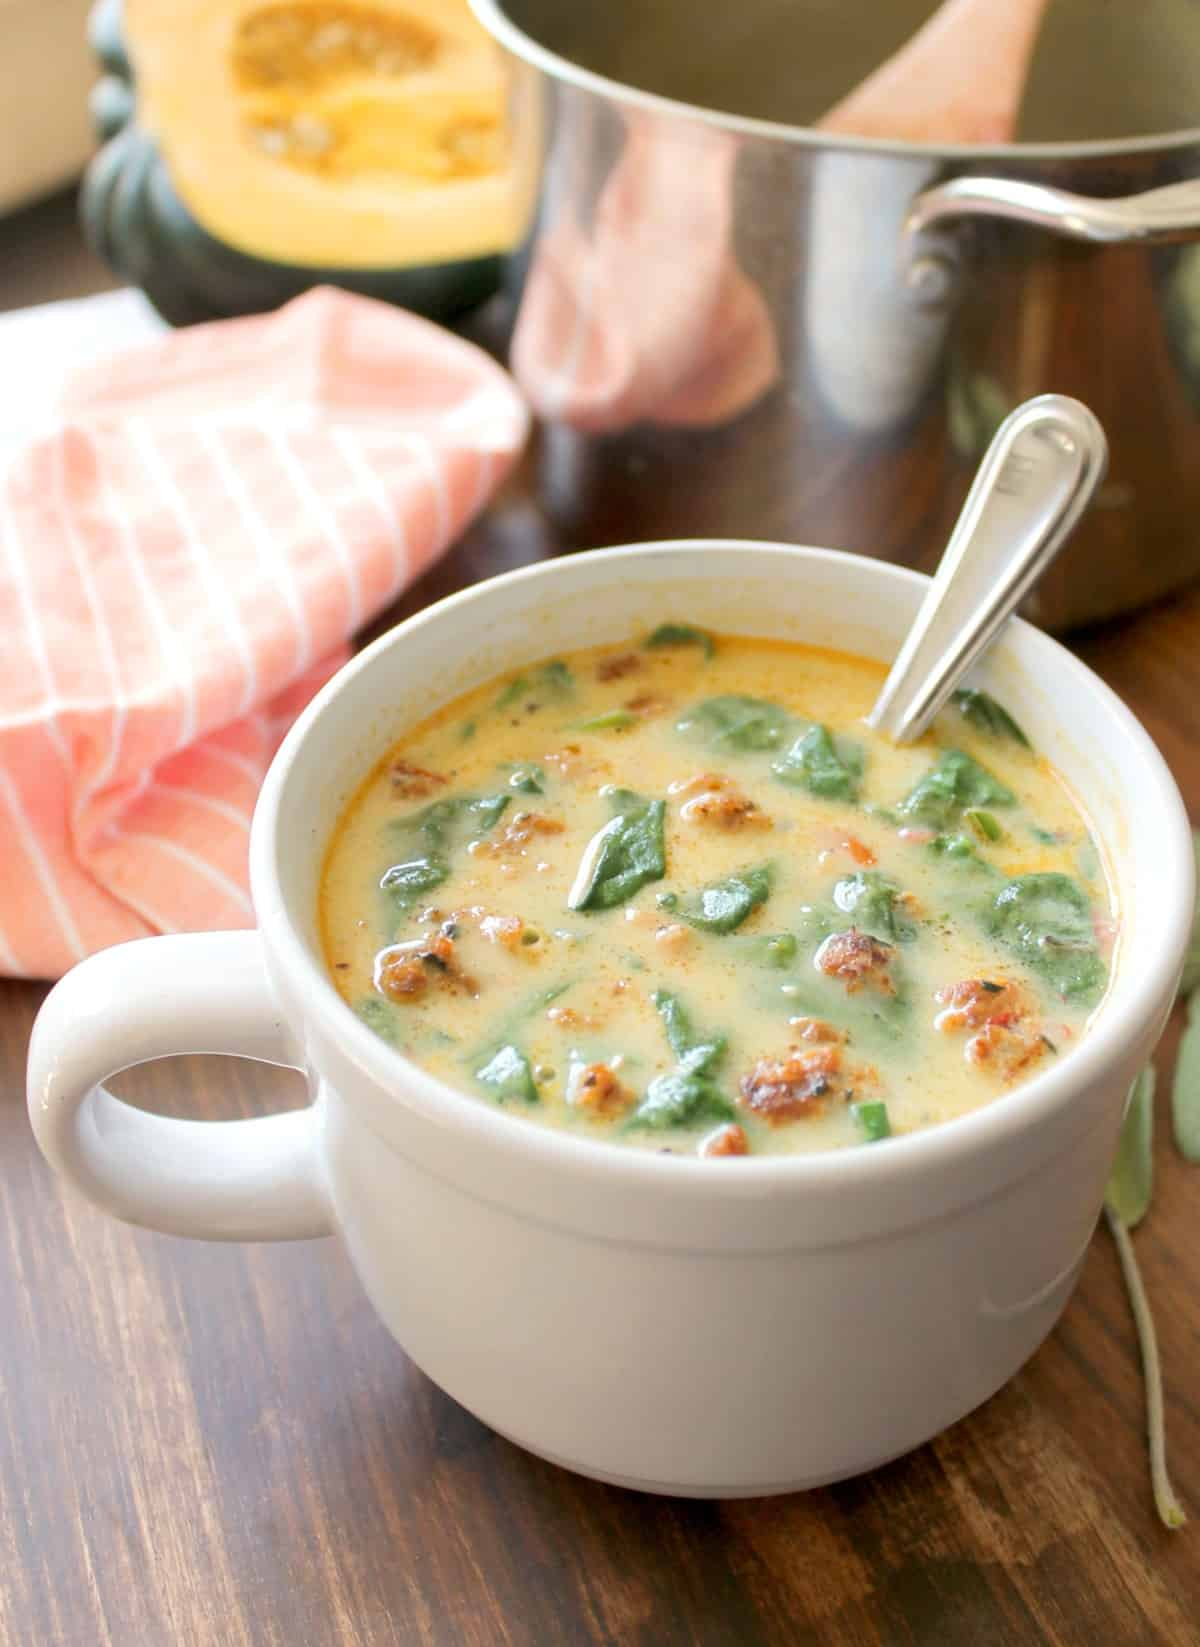 Sausage & Squash Soup